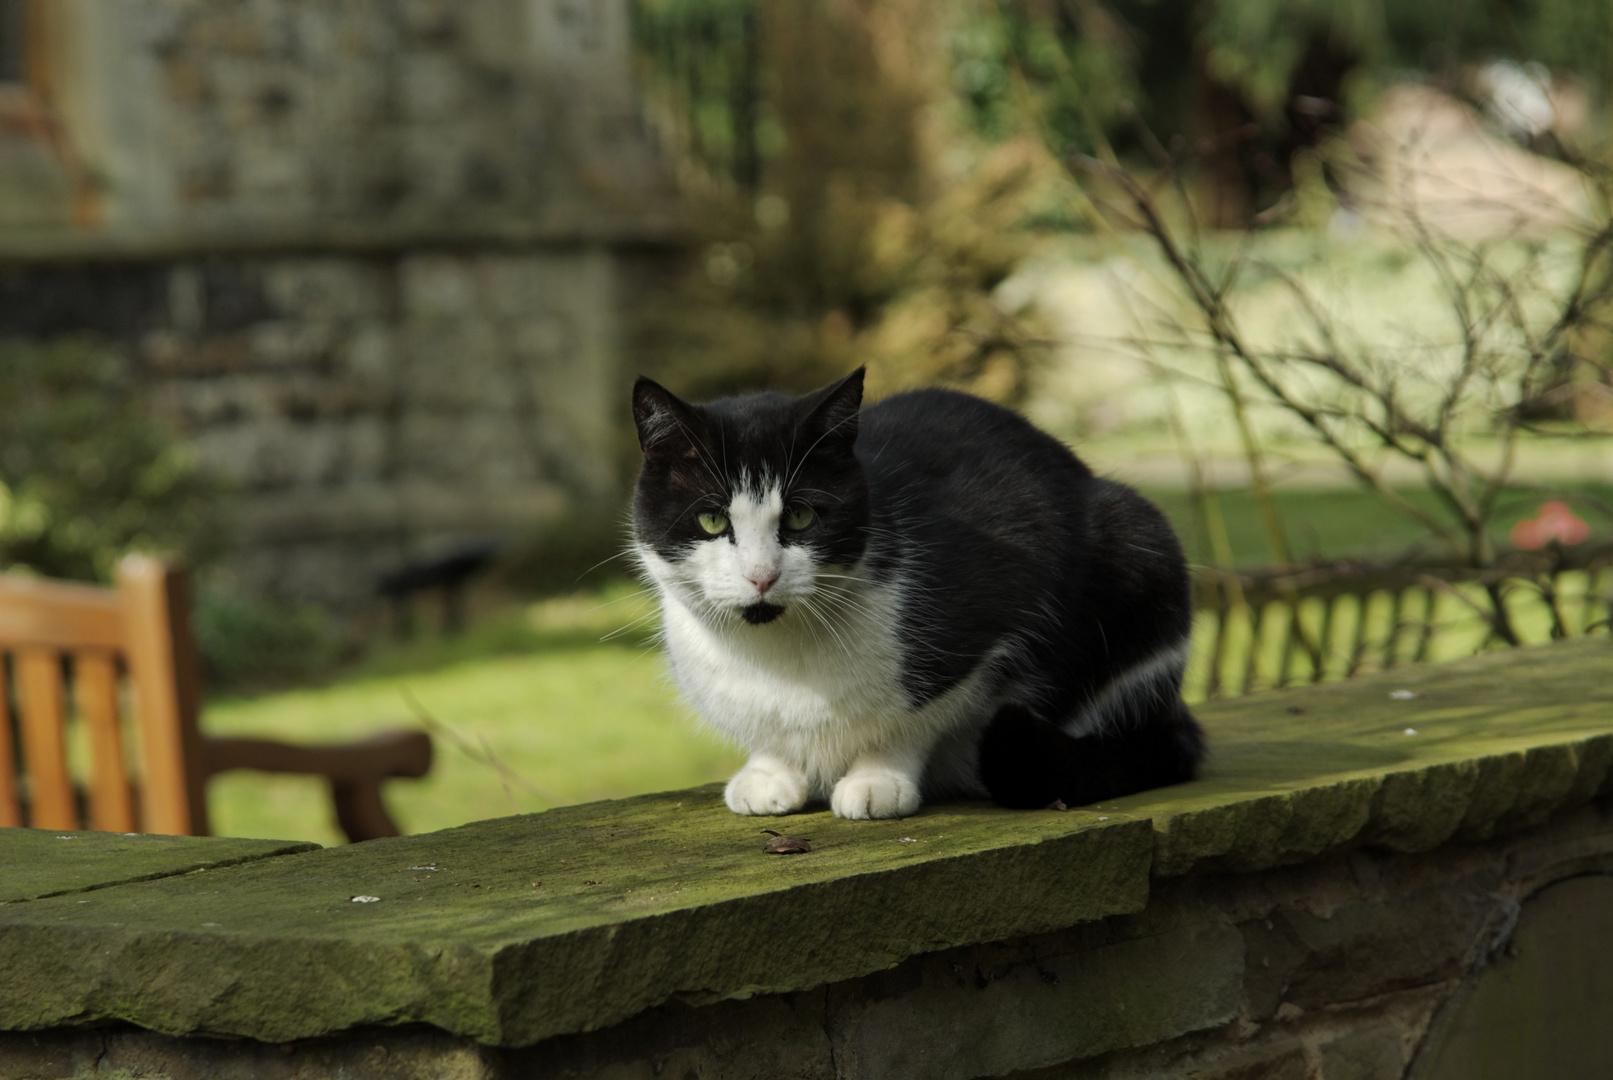 Katze in Positur